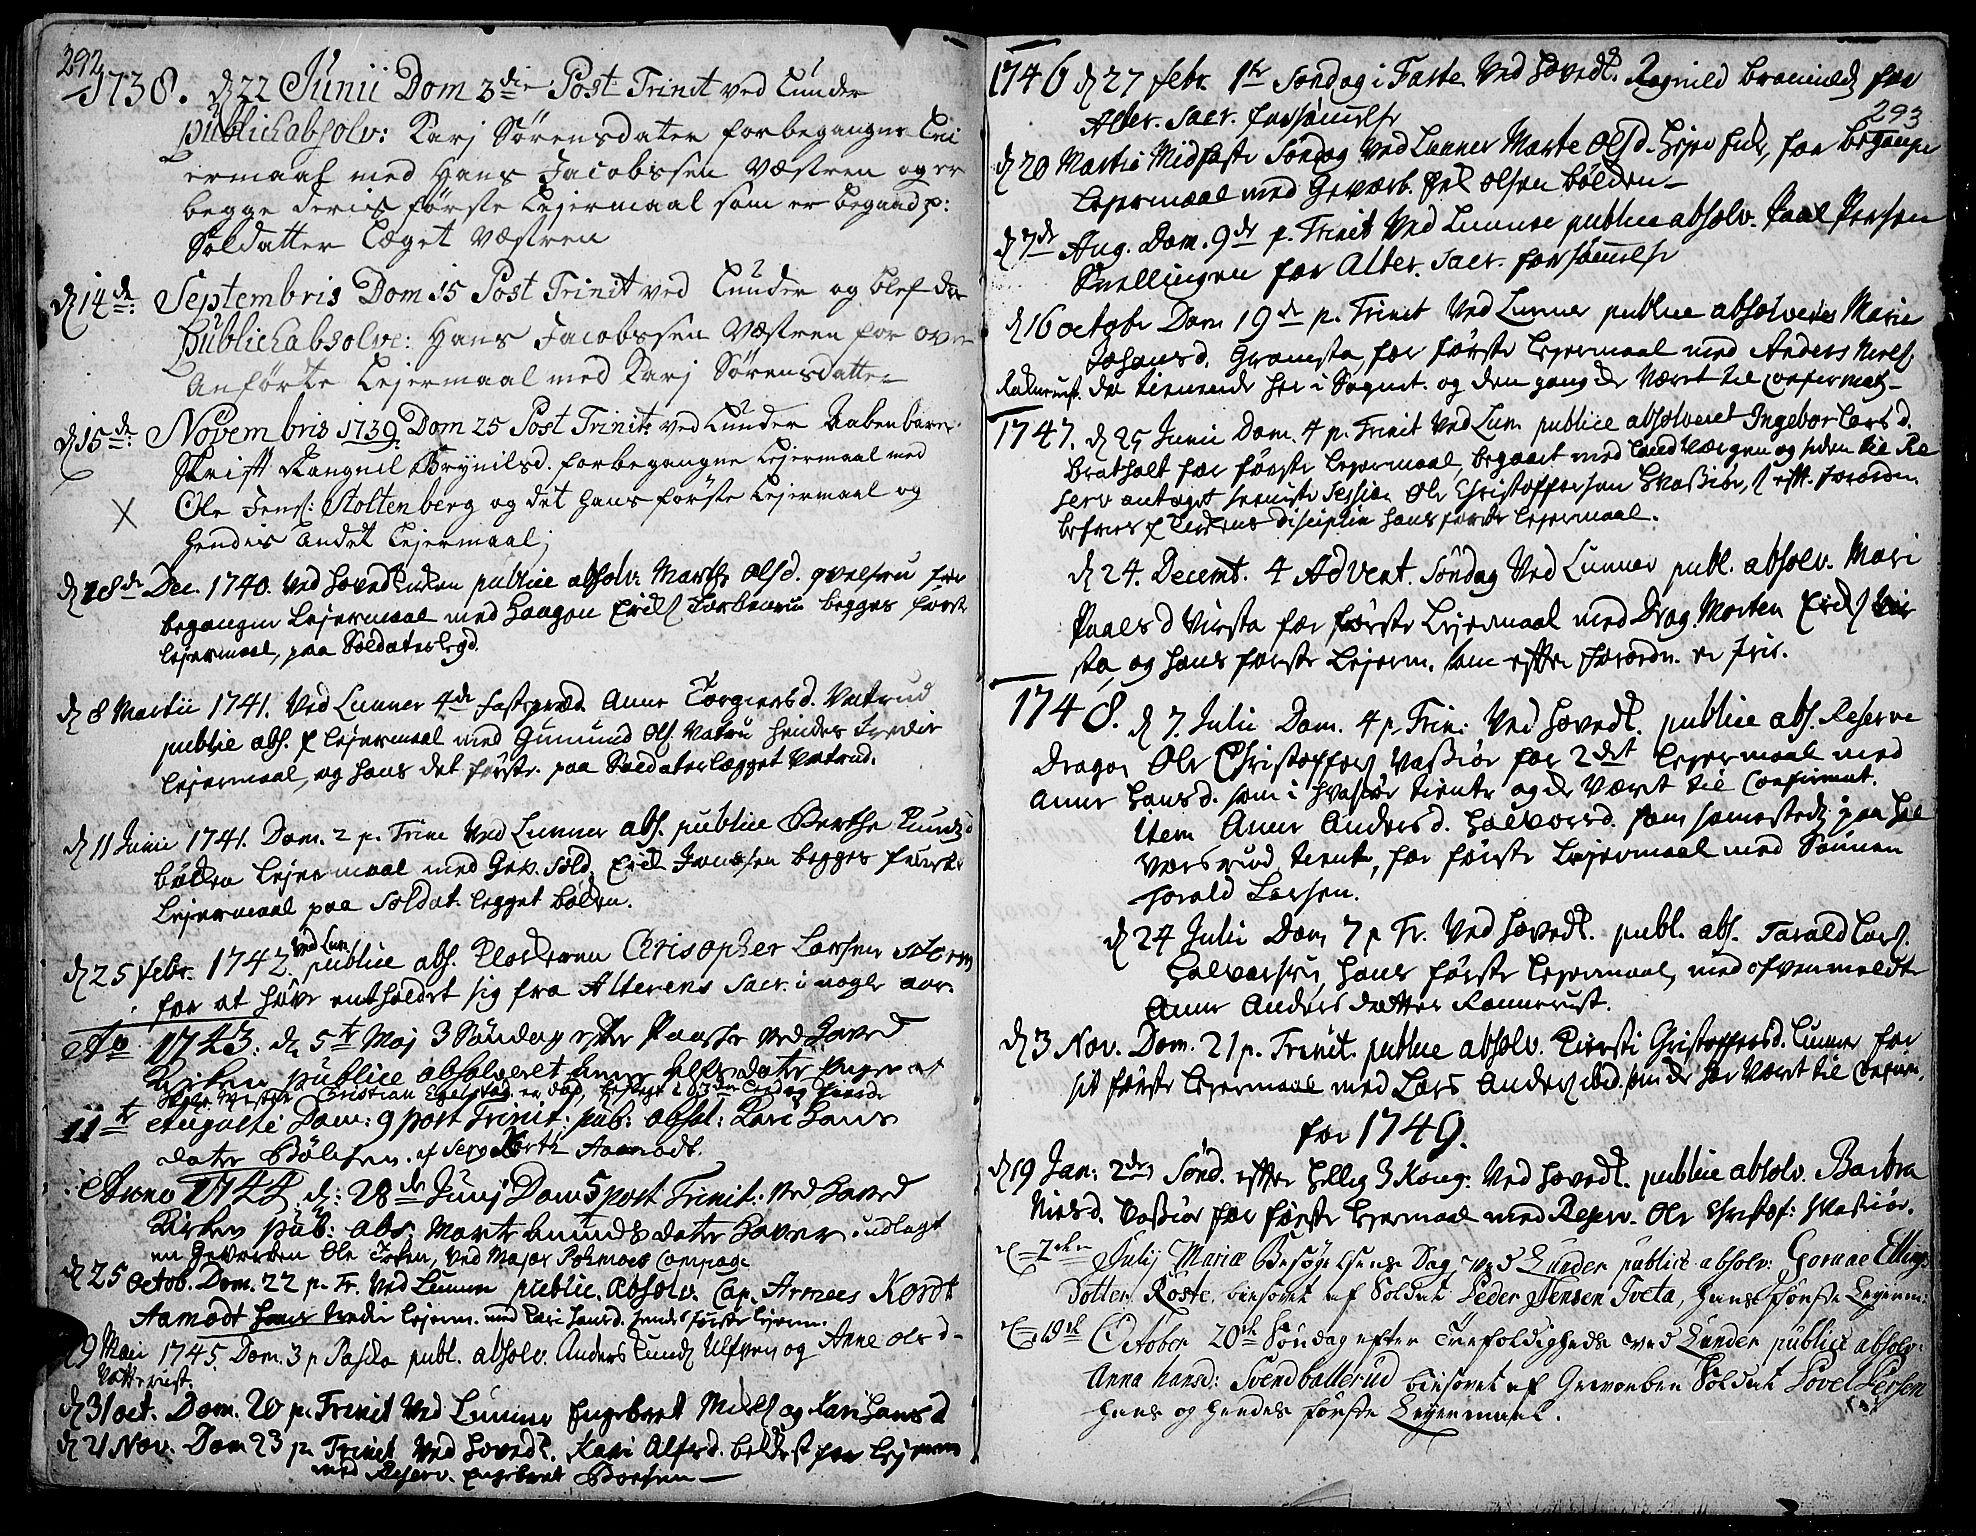 SAH, Jevnaker prestekontor, Ministerialbok nr. 2, 1725-1751, s. 292-293